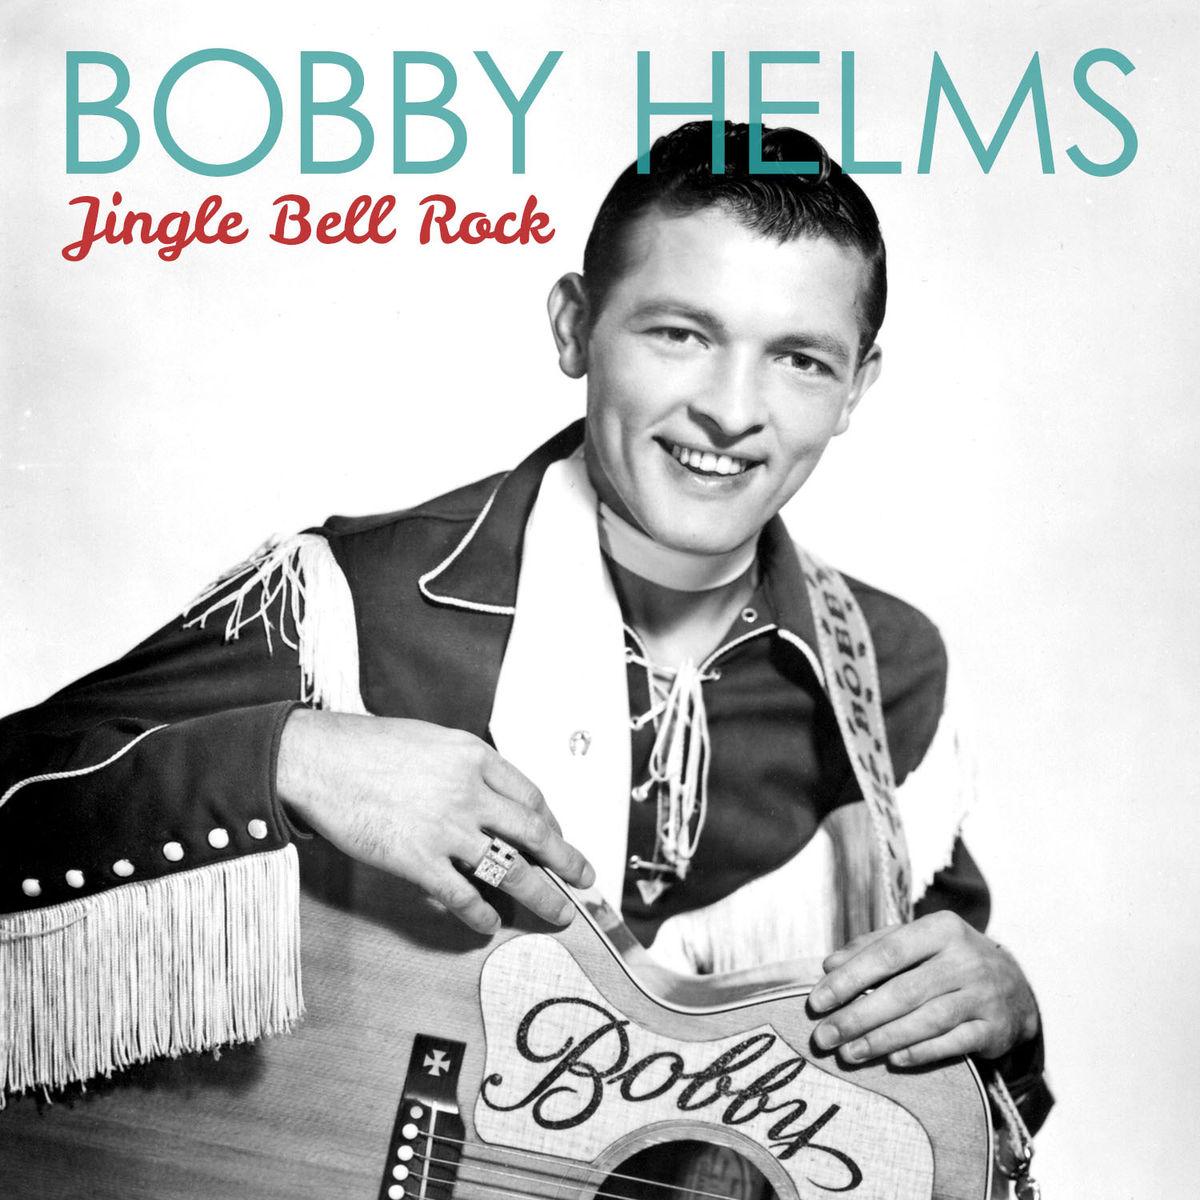 bobby_helms-jingle_bell_rock_s_4.jpg